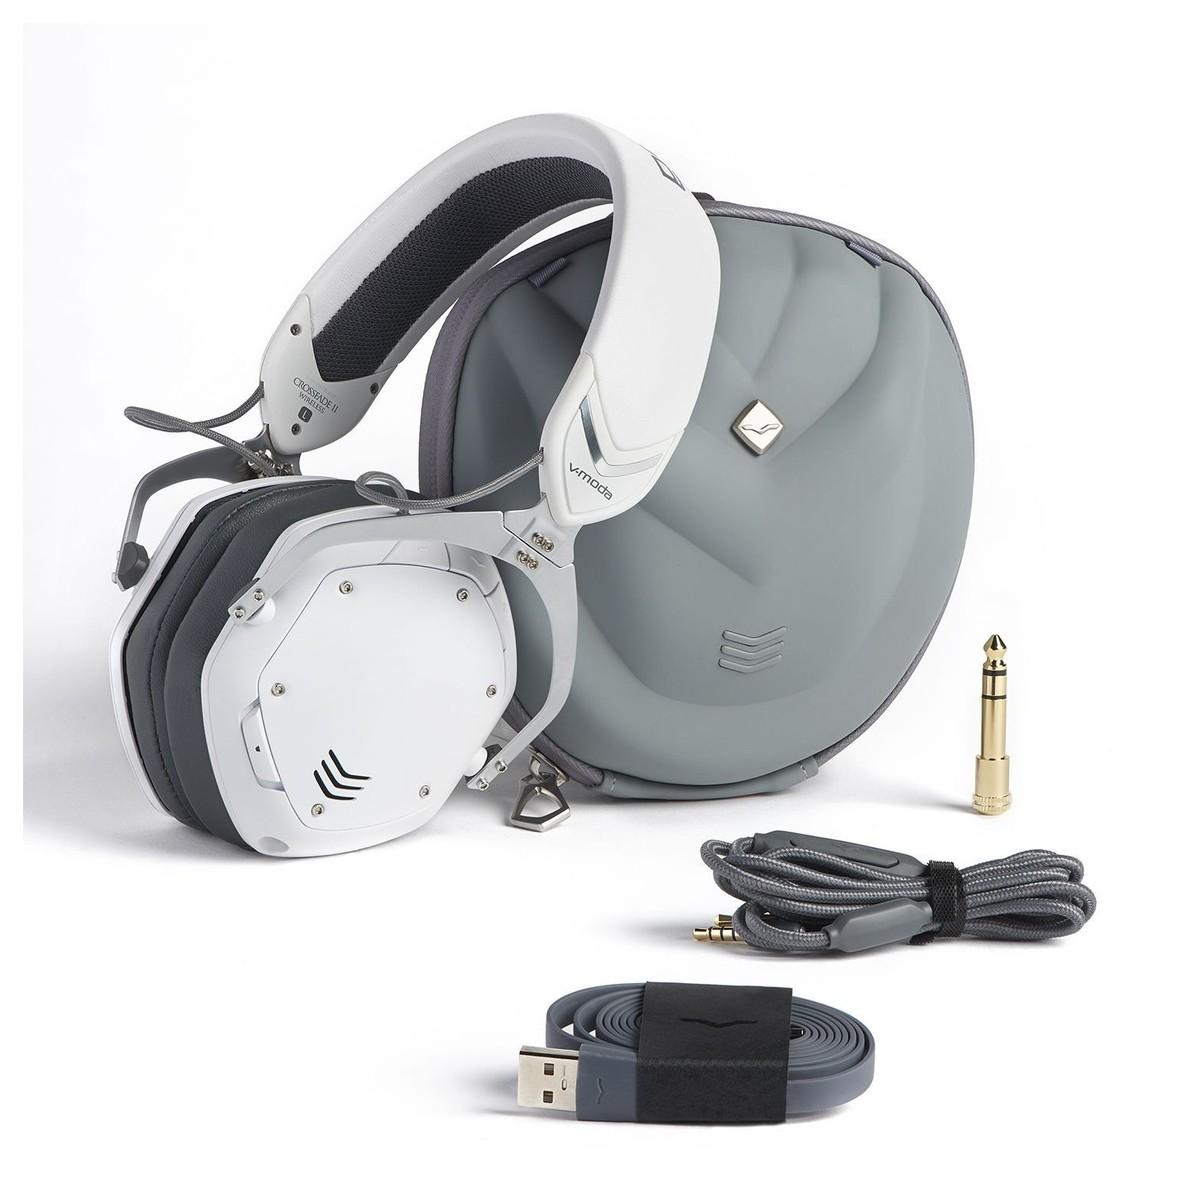 V Moda Crossfade Wireless Ii Bluetooth Headphones White At Gear4music Extra Fan Suzuki Carry Full Contents Loading Zoom